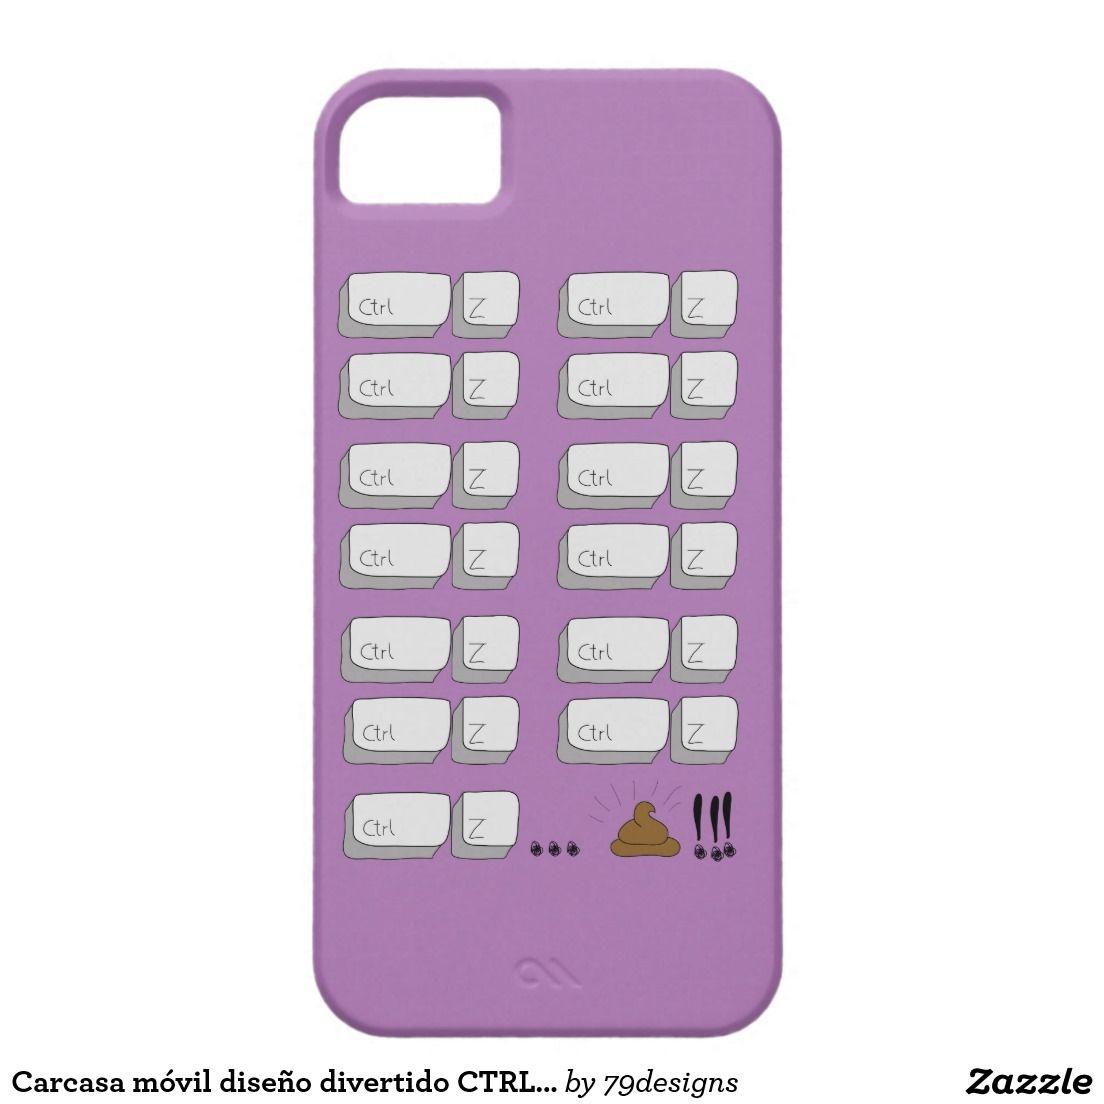 Carcasa móvil diseño divertido CTRL-Z iPhone 5 Protector